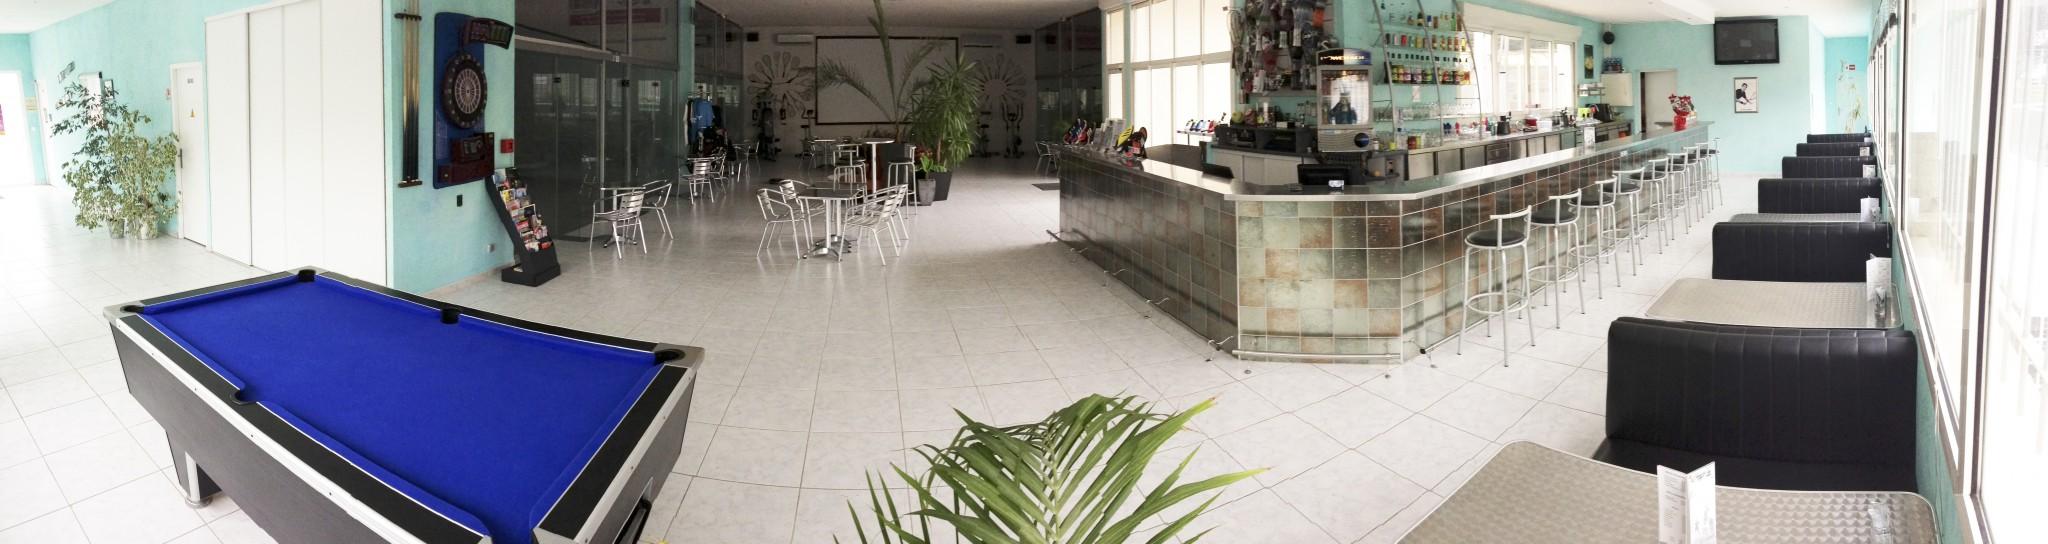 indoor center narbonne